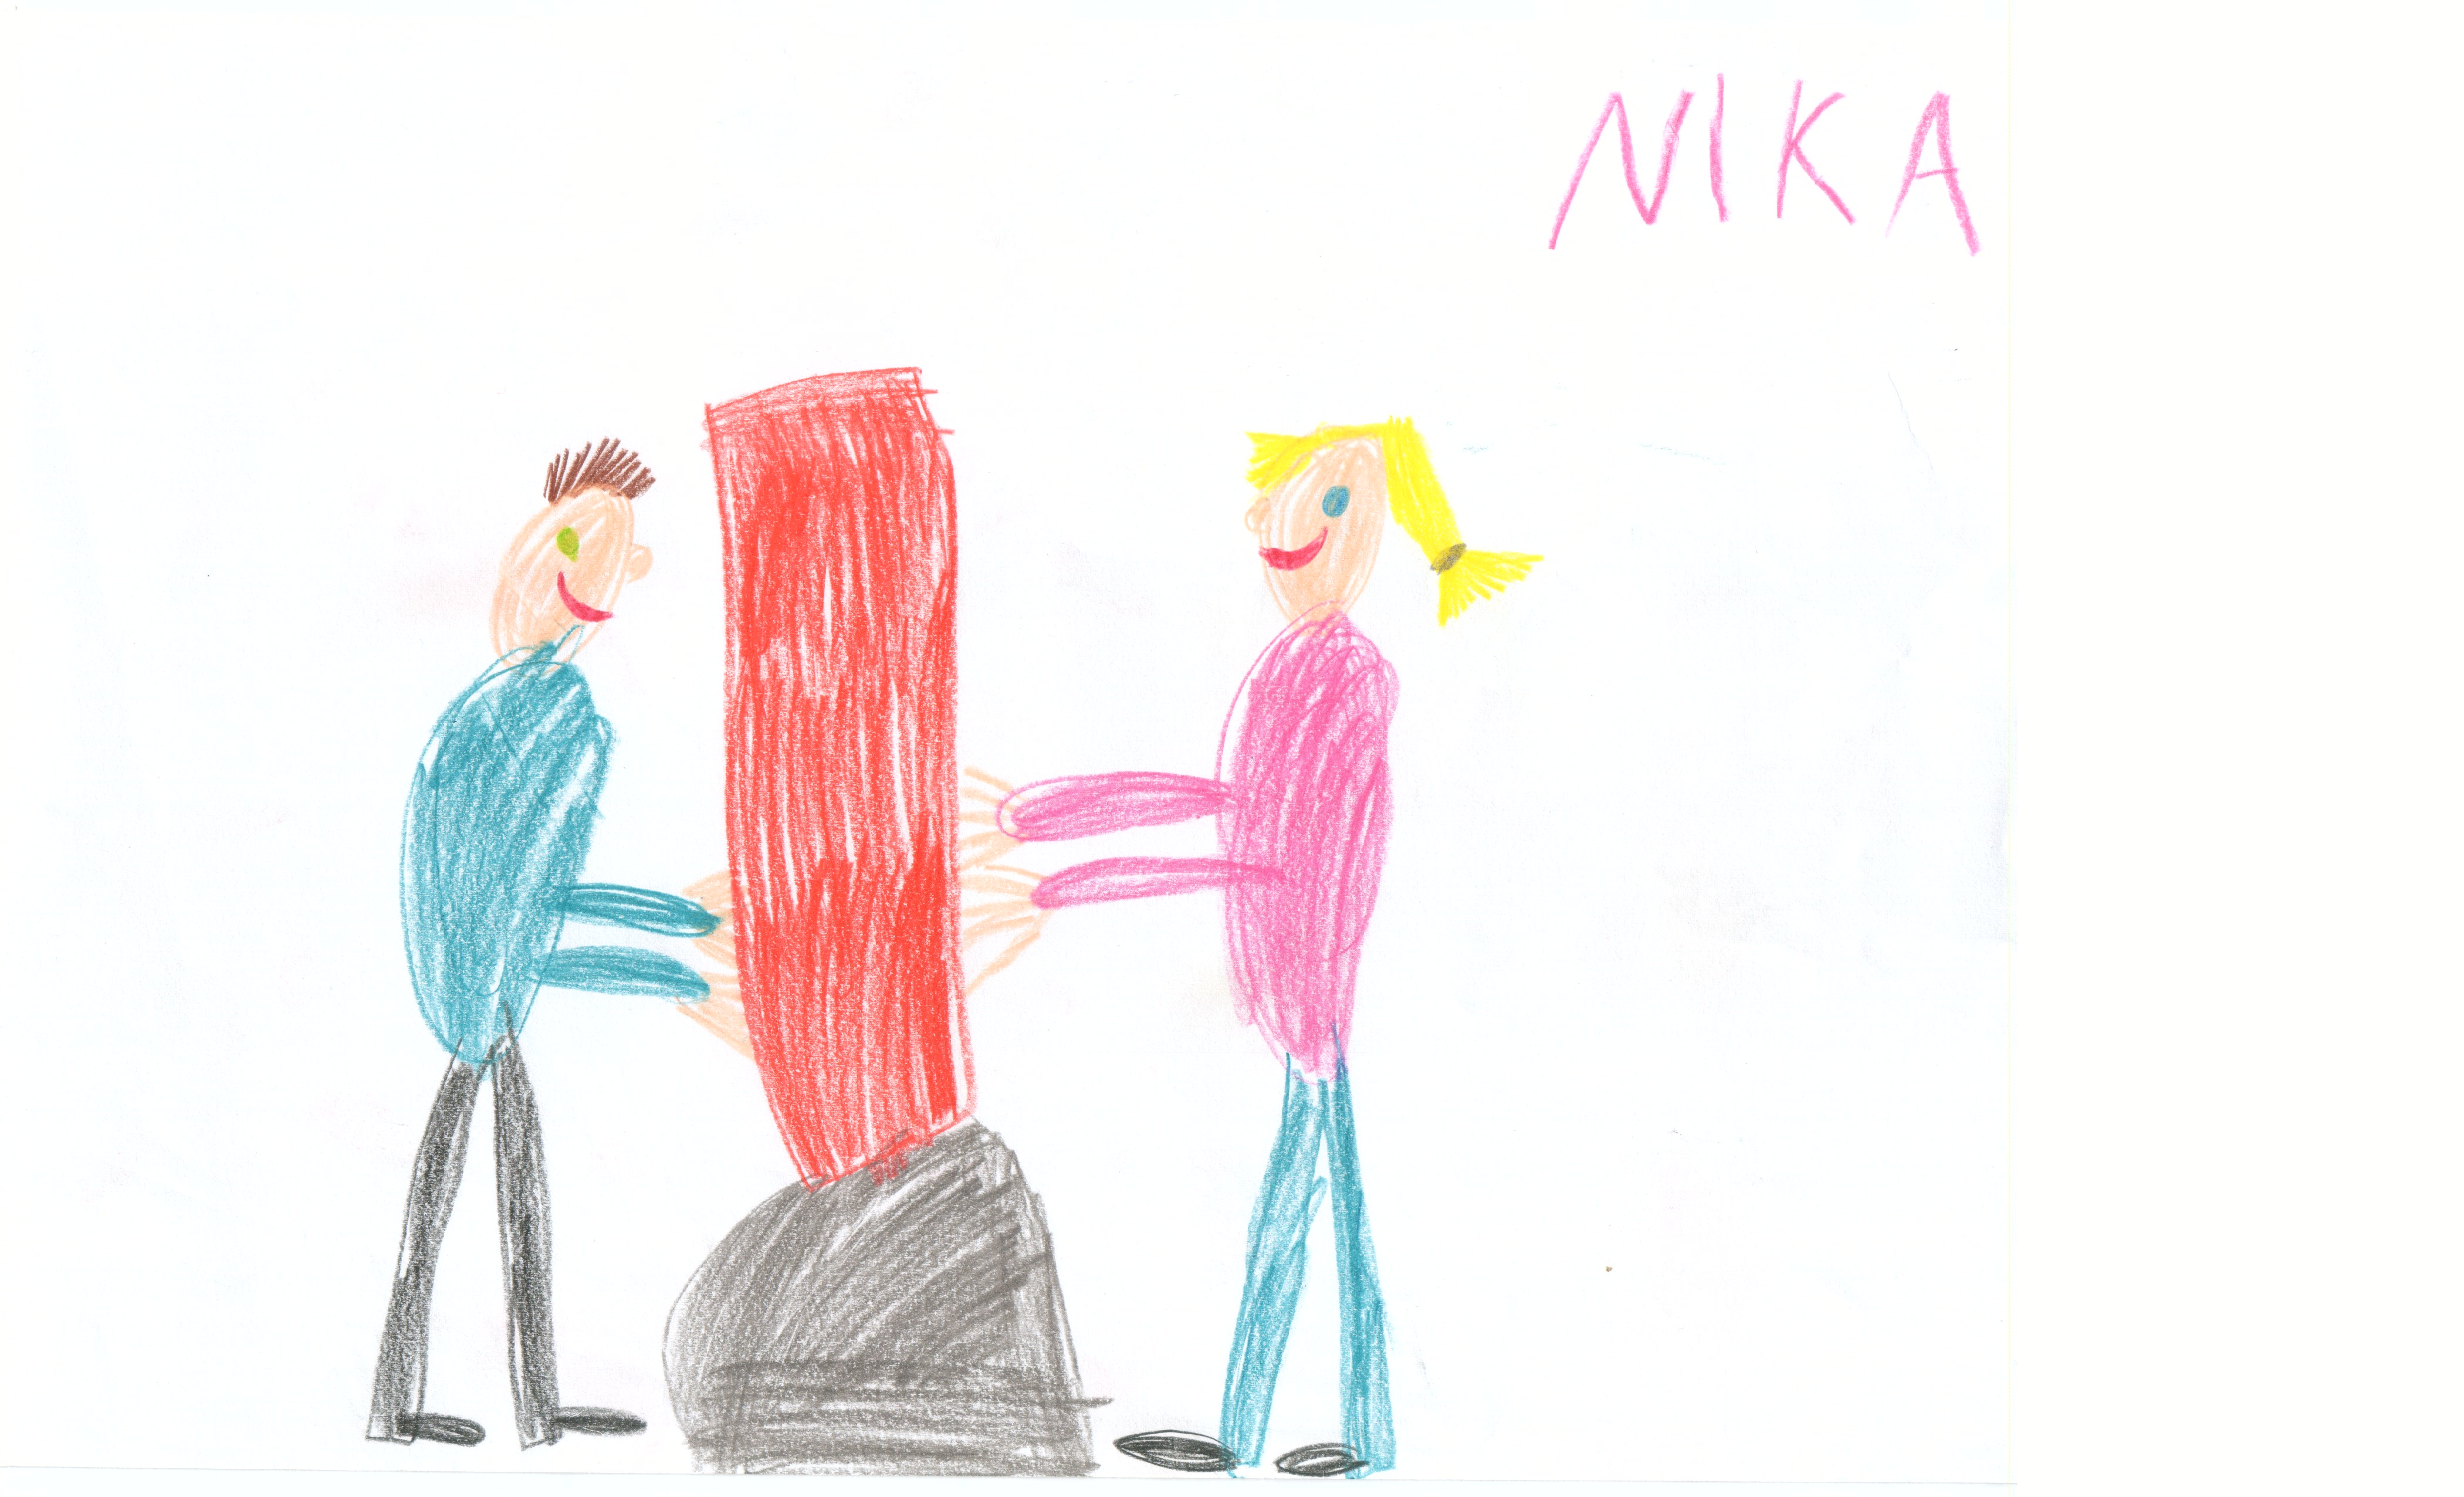 Obrázok malej Fitboxerky Niki